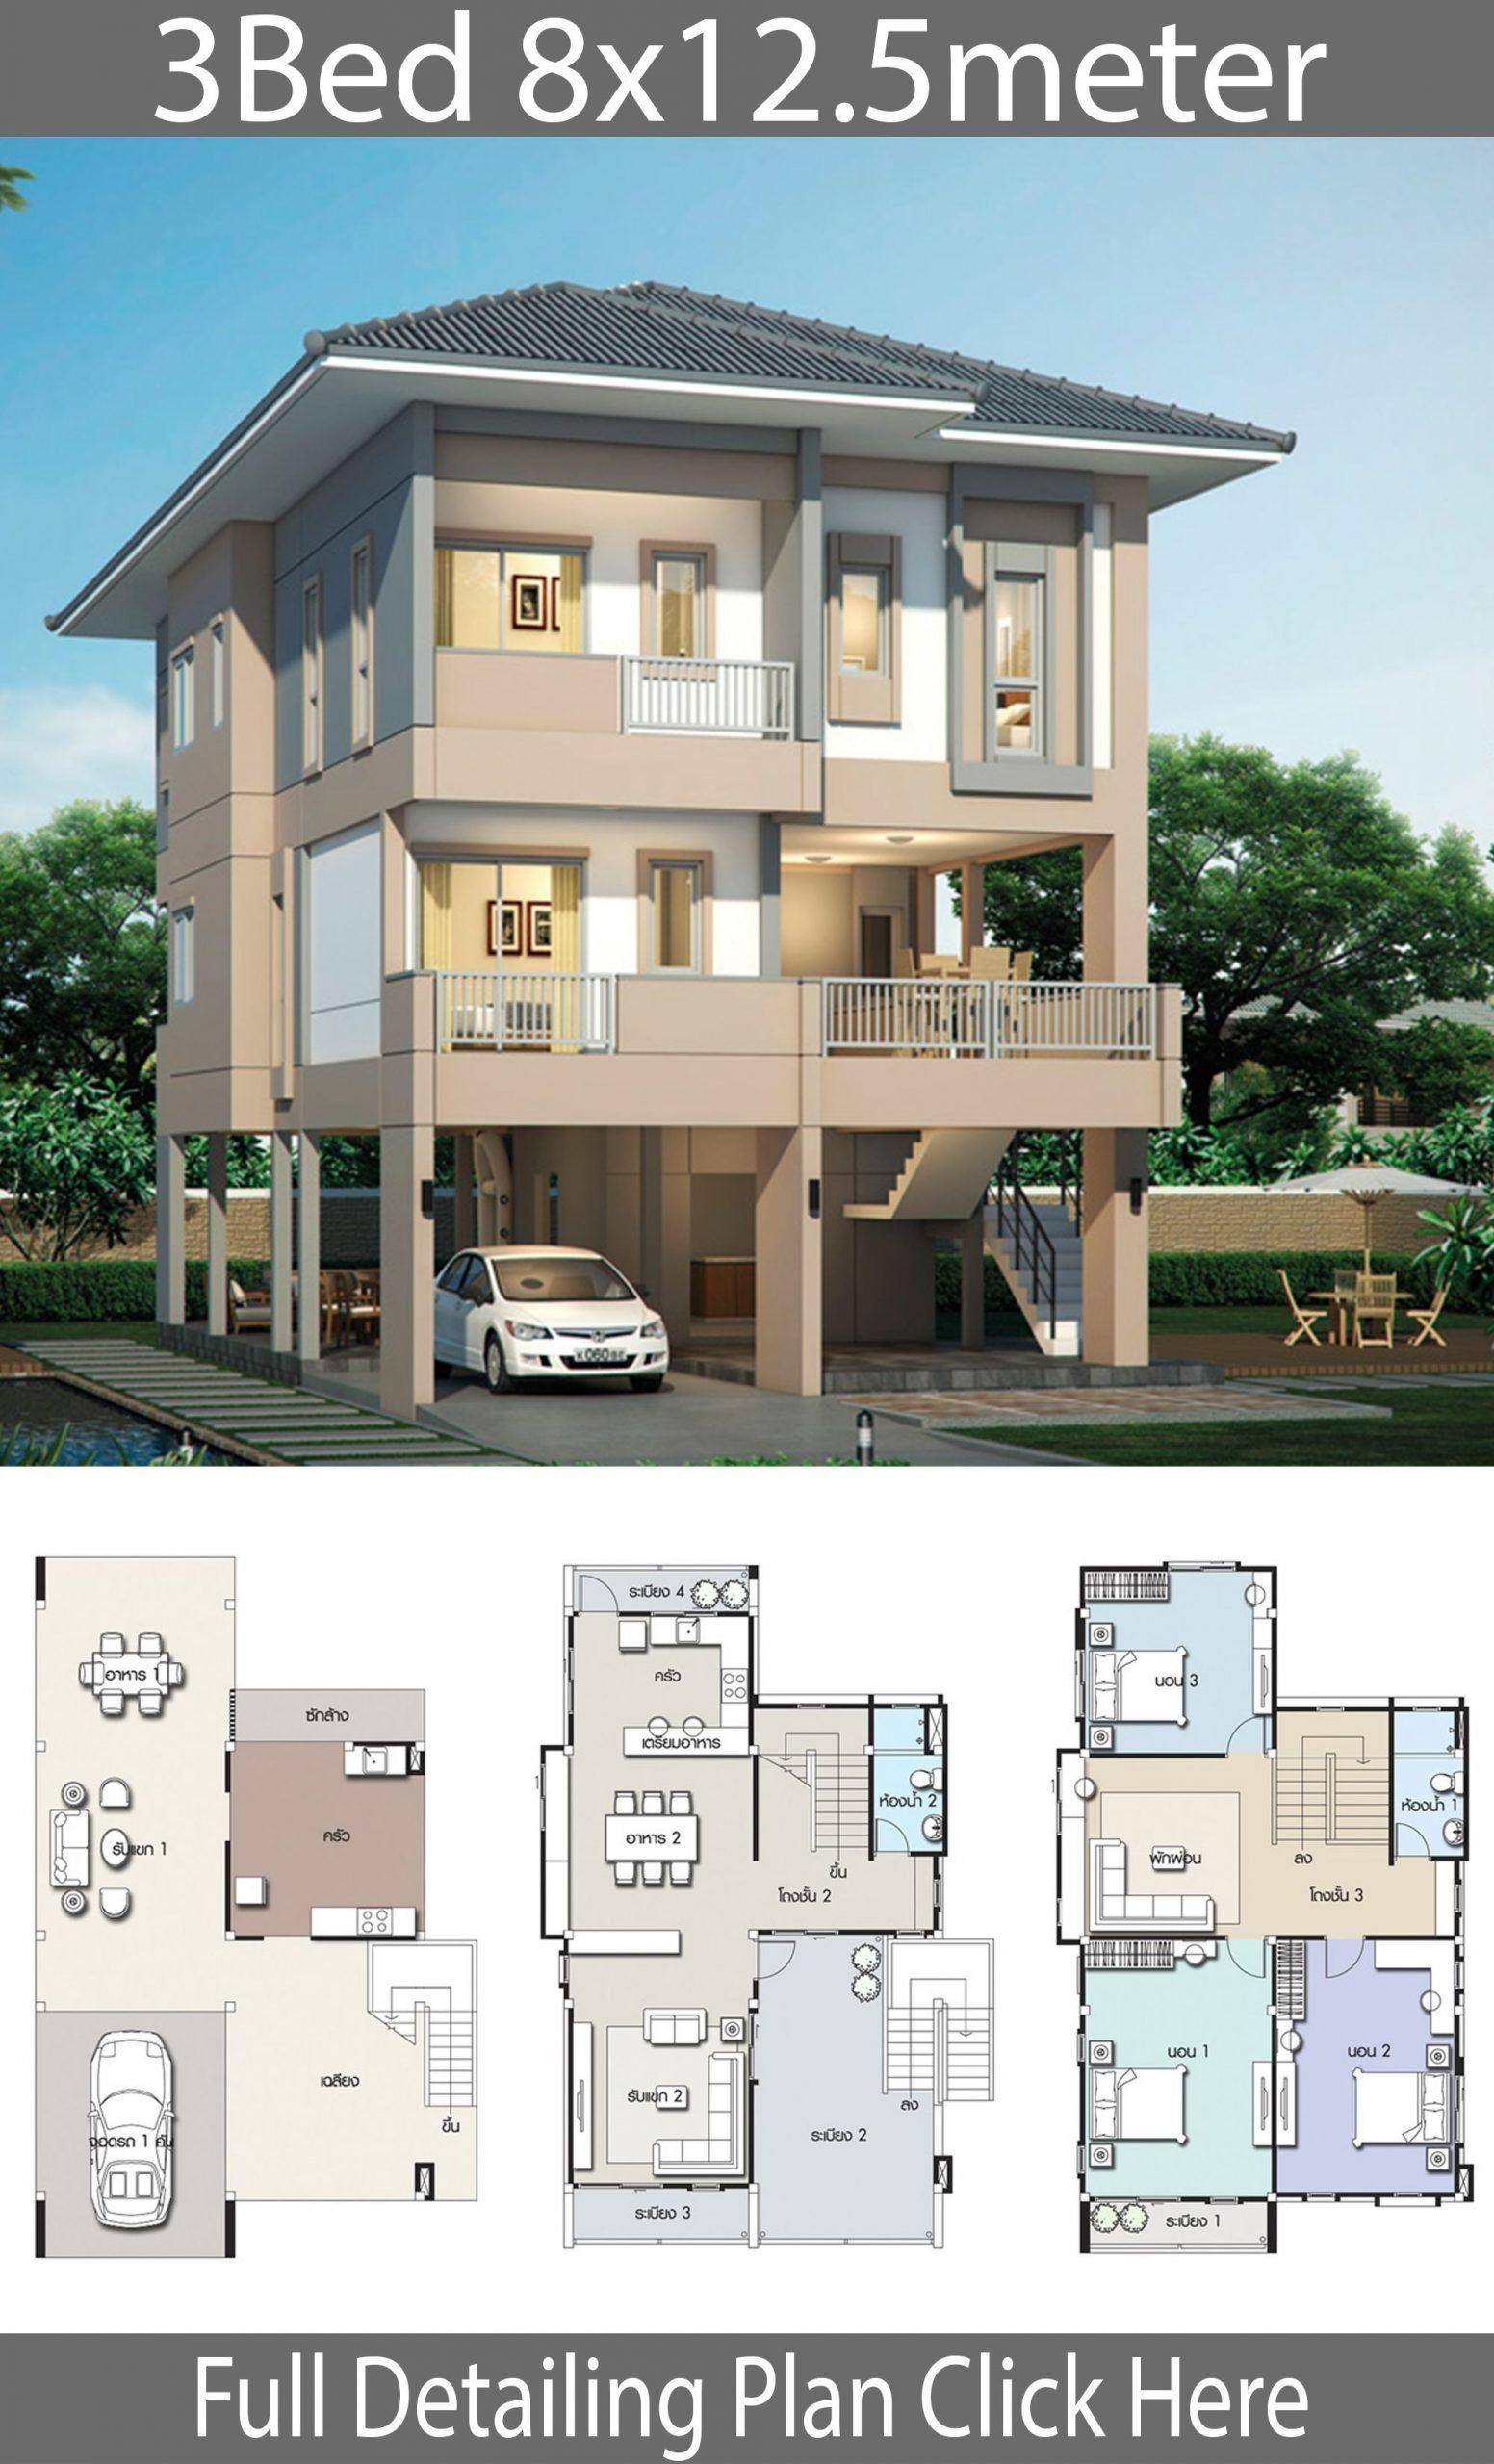 3 Storey Modern House Floor Plans House Design Plan 8x12 5m With 3 Bedrooms 3 Storey House Design Model House Plan Modern House Design